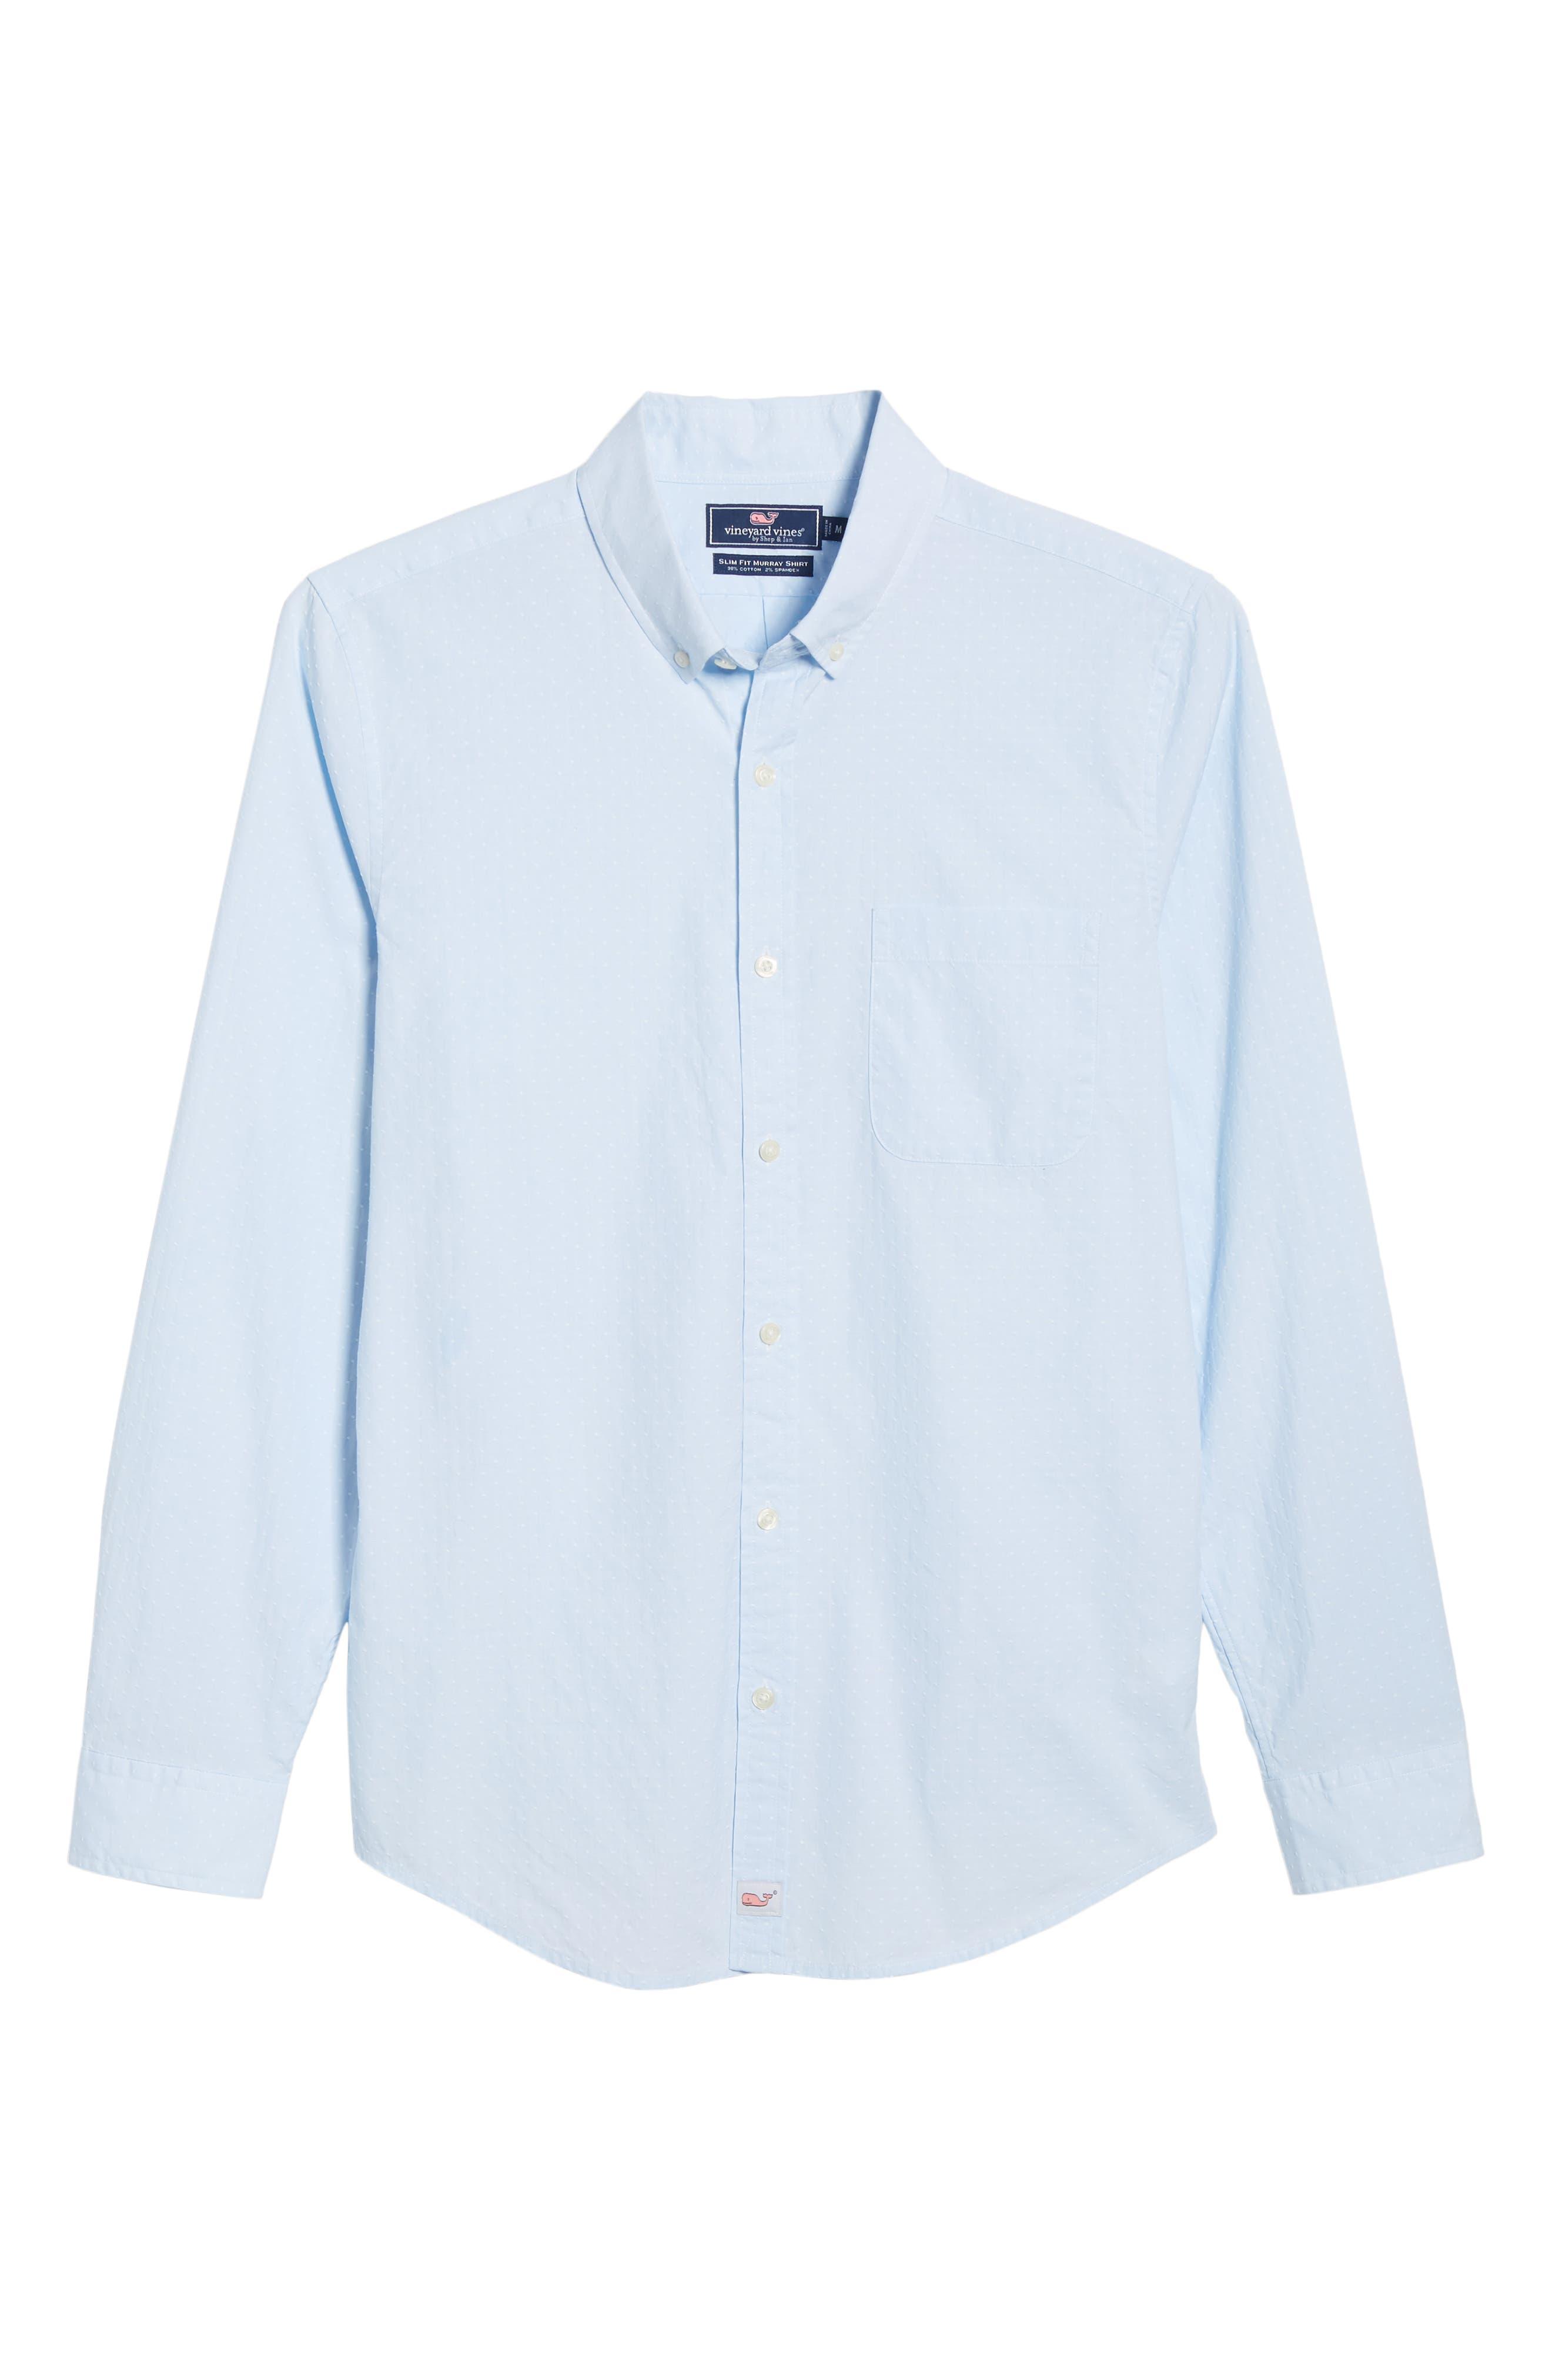 VINEYARD VINES, Wavine Slim Fit Dobby Sport Shirt, Alternate thumbnail 5, color, JAKE BLUE